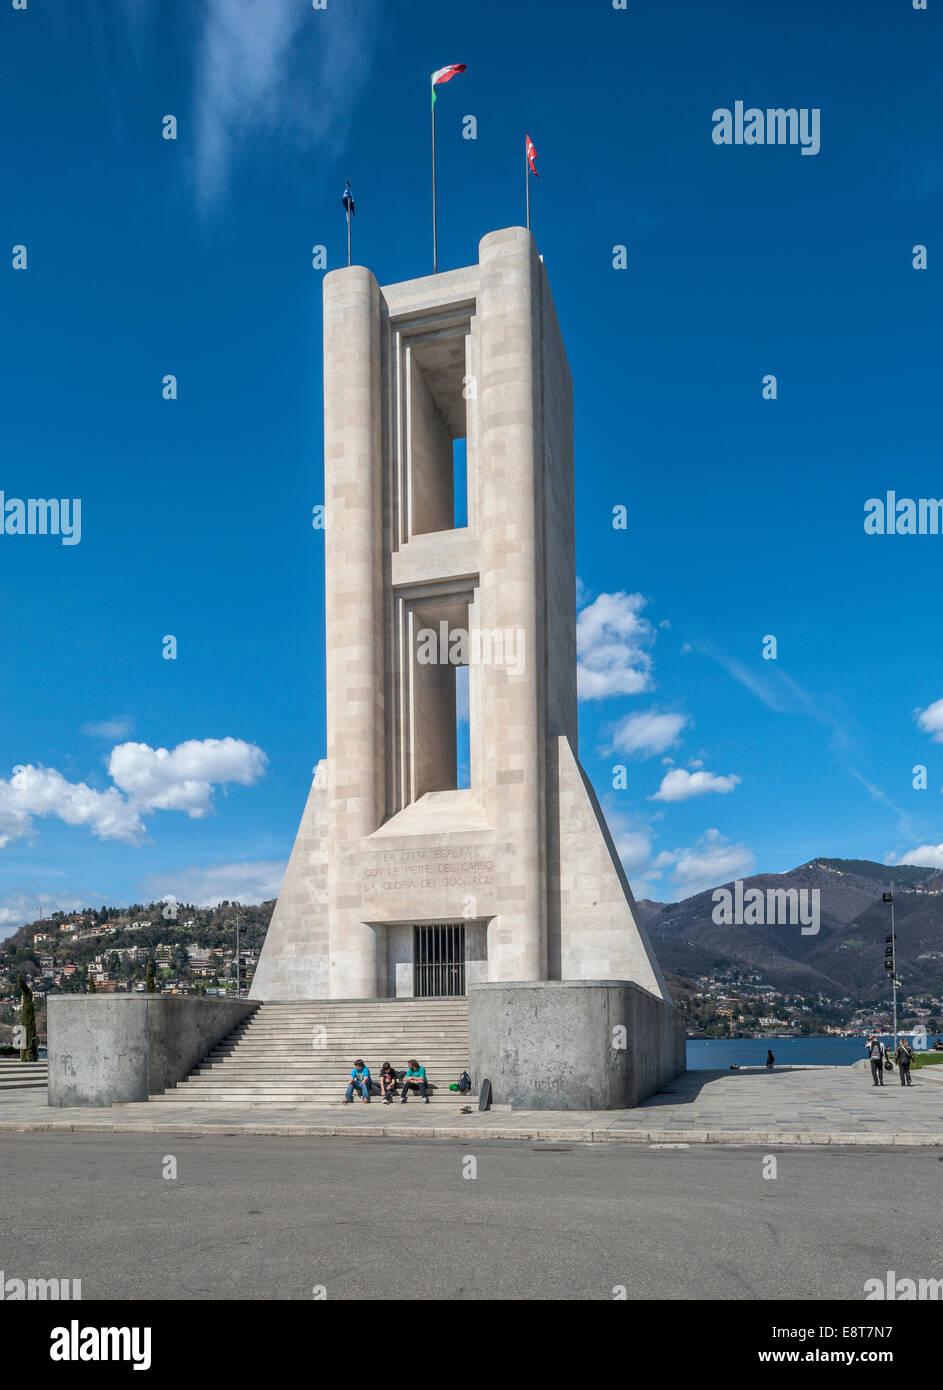 Monumento ai Caduti War memorial on Lake Como, architect Giuseppe Terragni, neoclassicism, Como, Italy - Stock Image